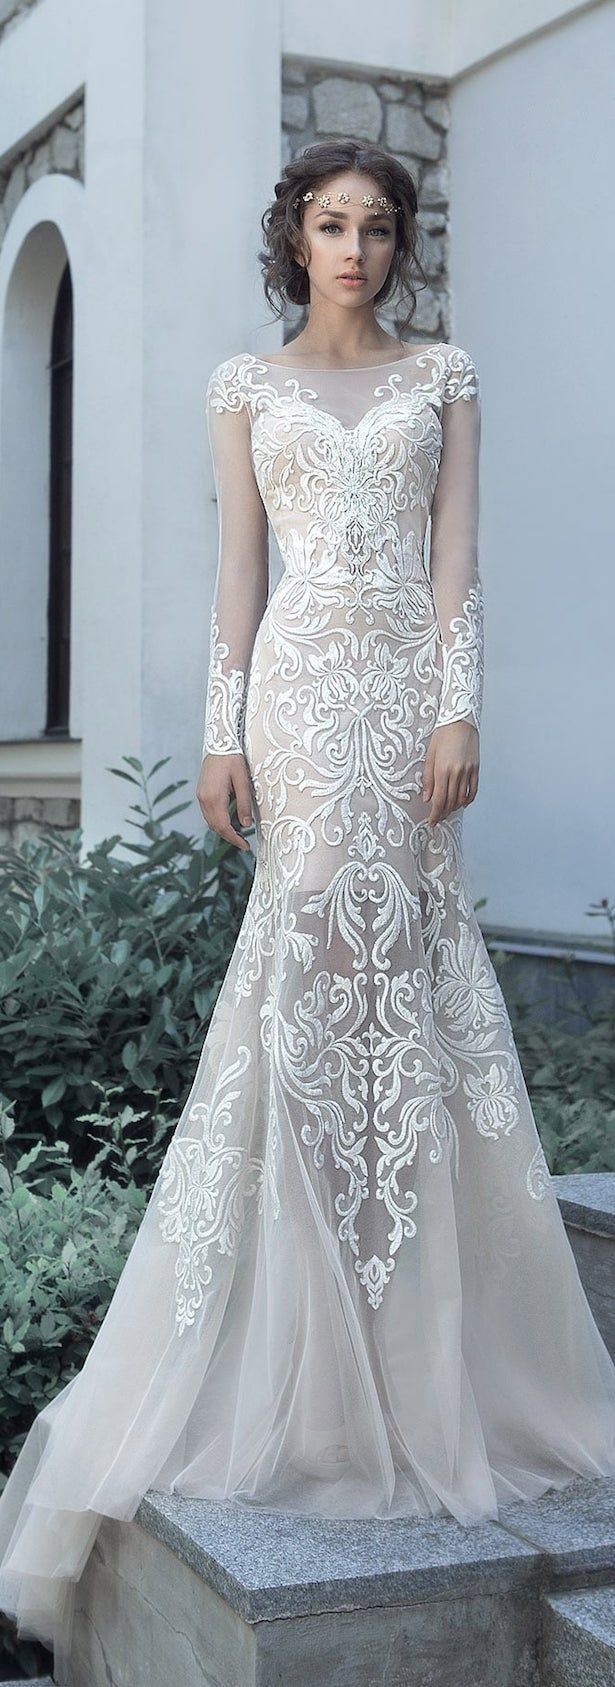 Milva wedding dresses u sunrise collection gorgeous n